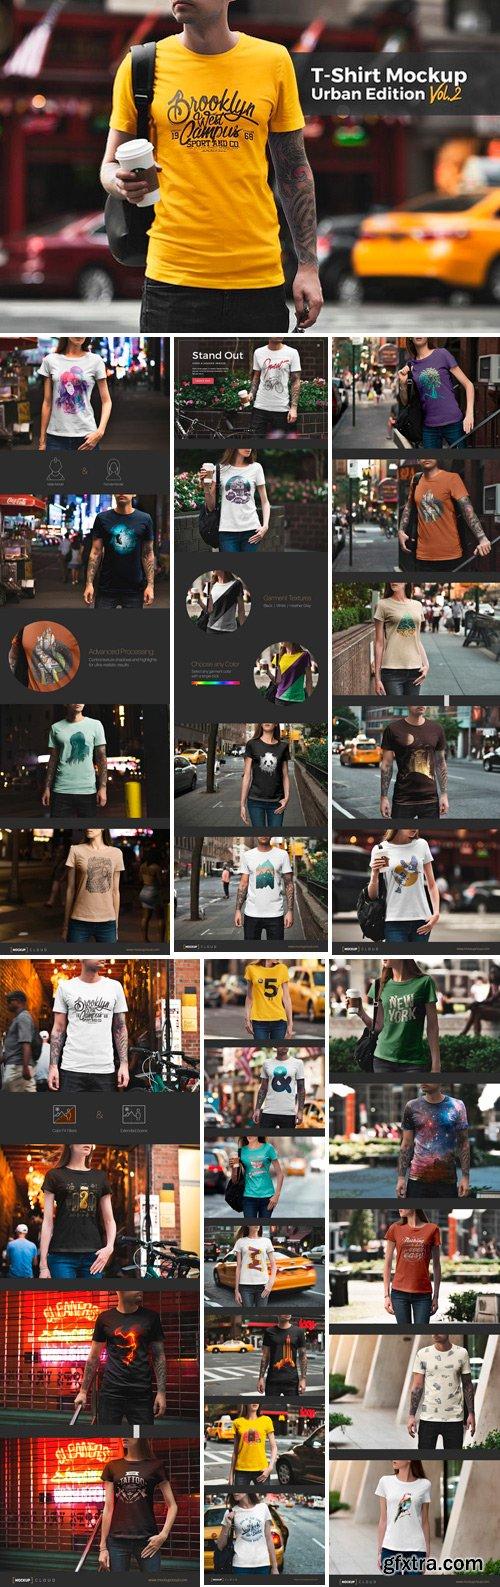 CM - T-Shirt Mockup / Urban Edition 1664349